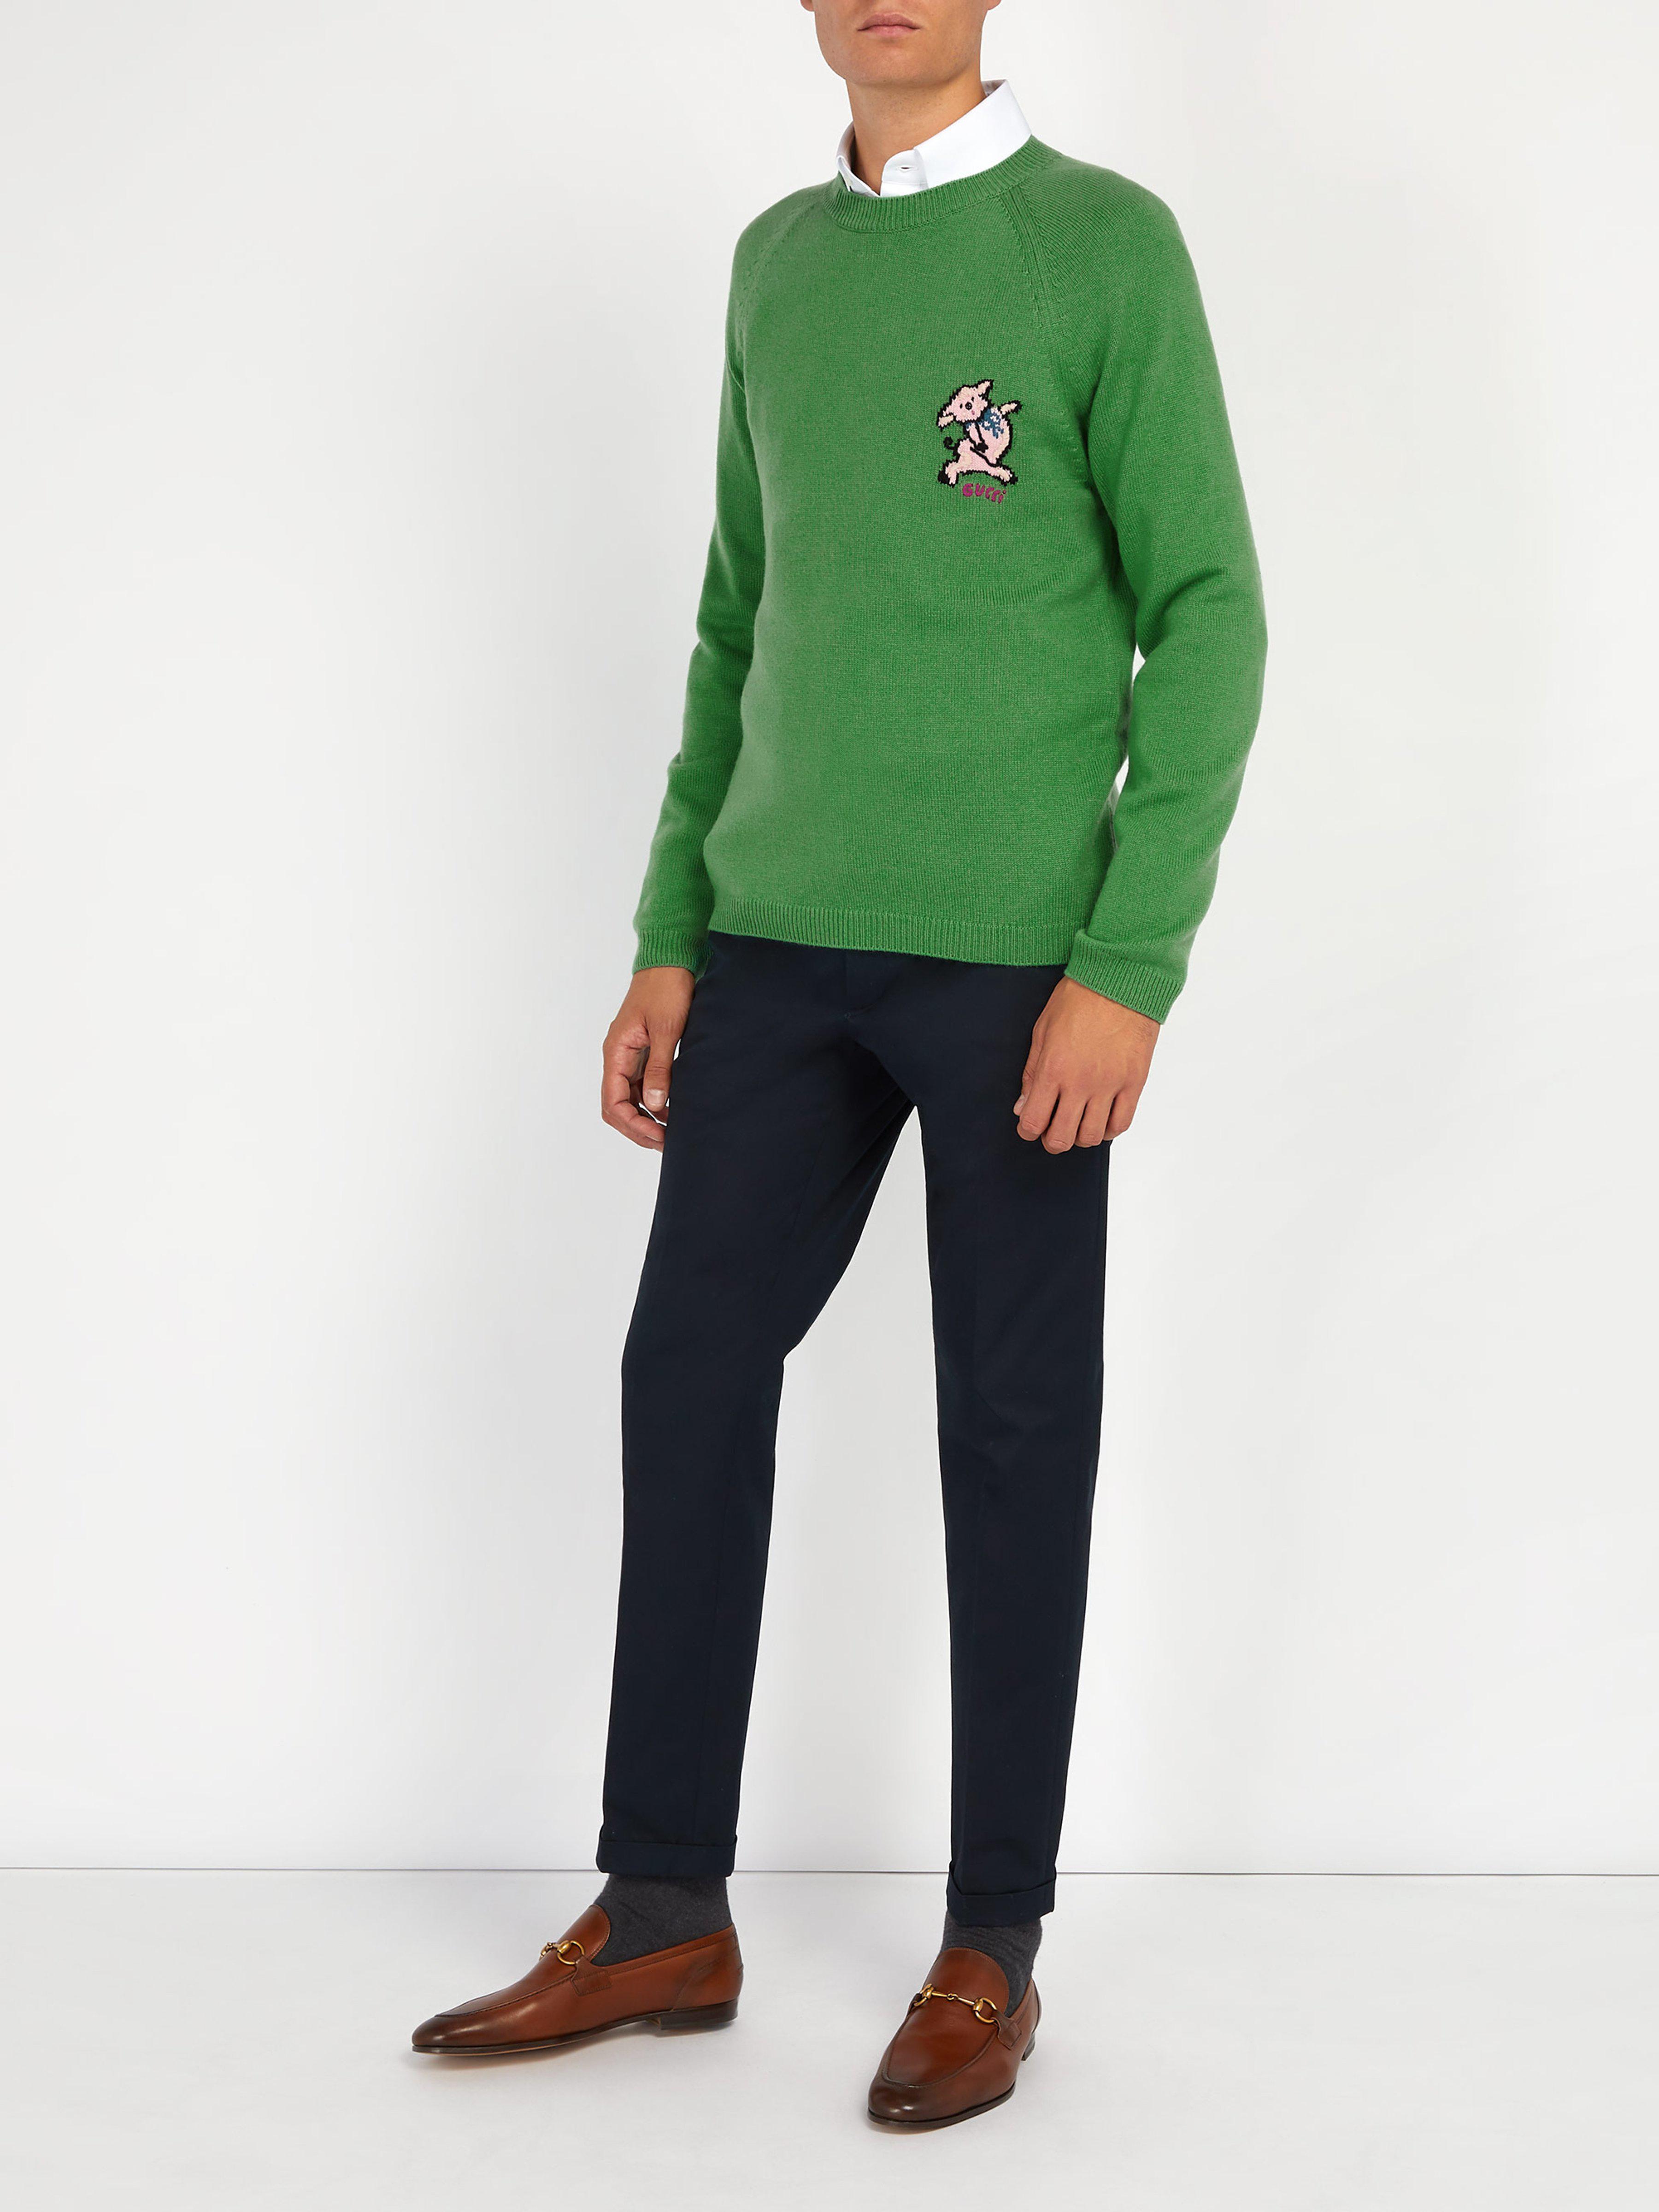 e98c6e6916e Gucci Pig Appliqué Patch Cashmere Sweater in Green for Men - Lyst